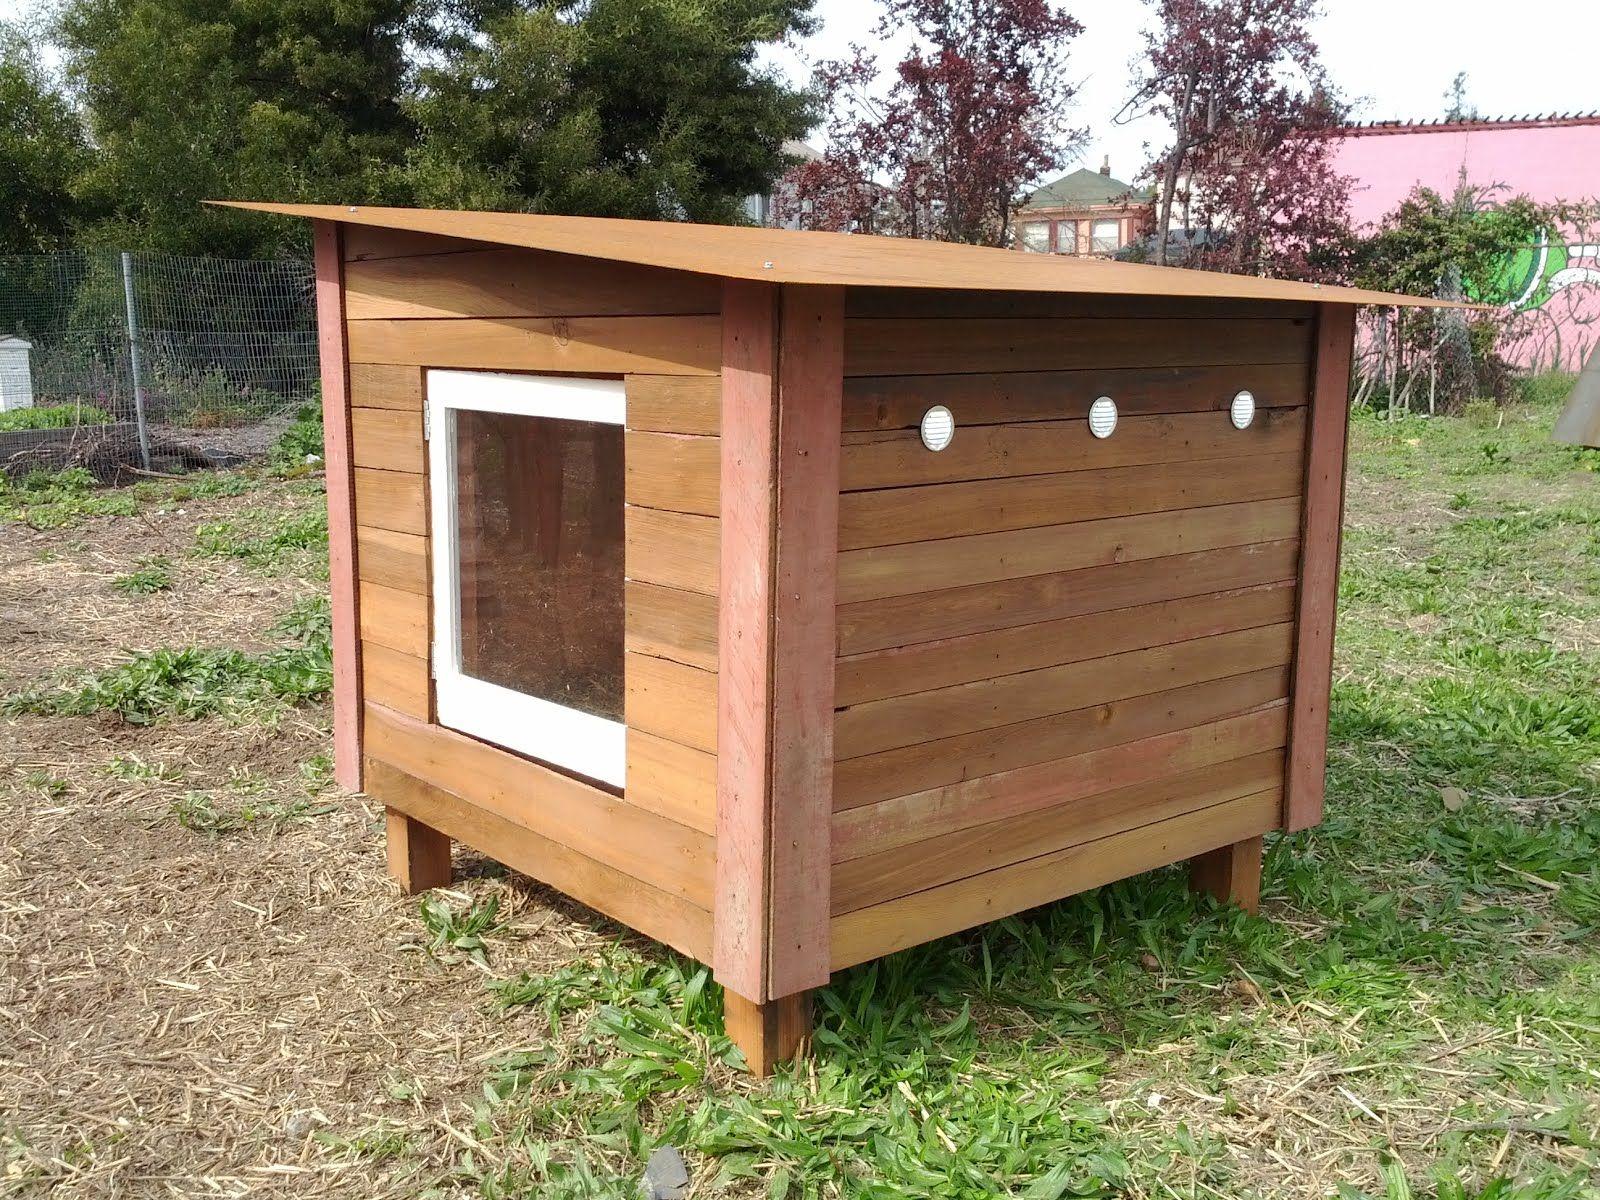 Just Fine Design Build Building A Chicken Coop Backyard Chicken Coops Chicken Coop Backyard poultry house design